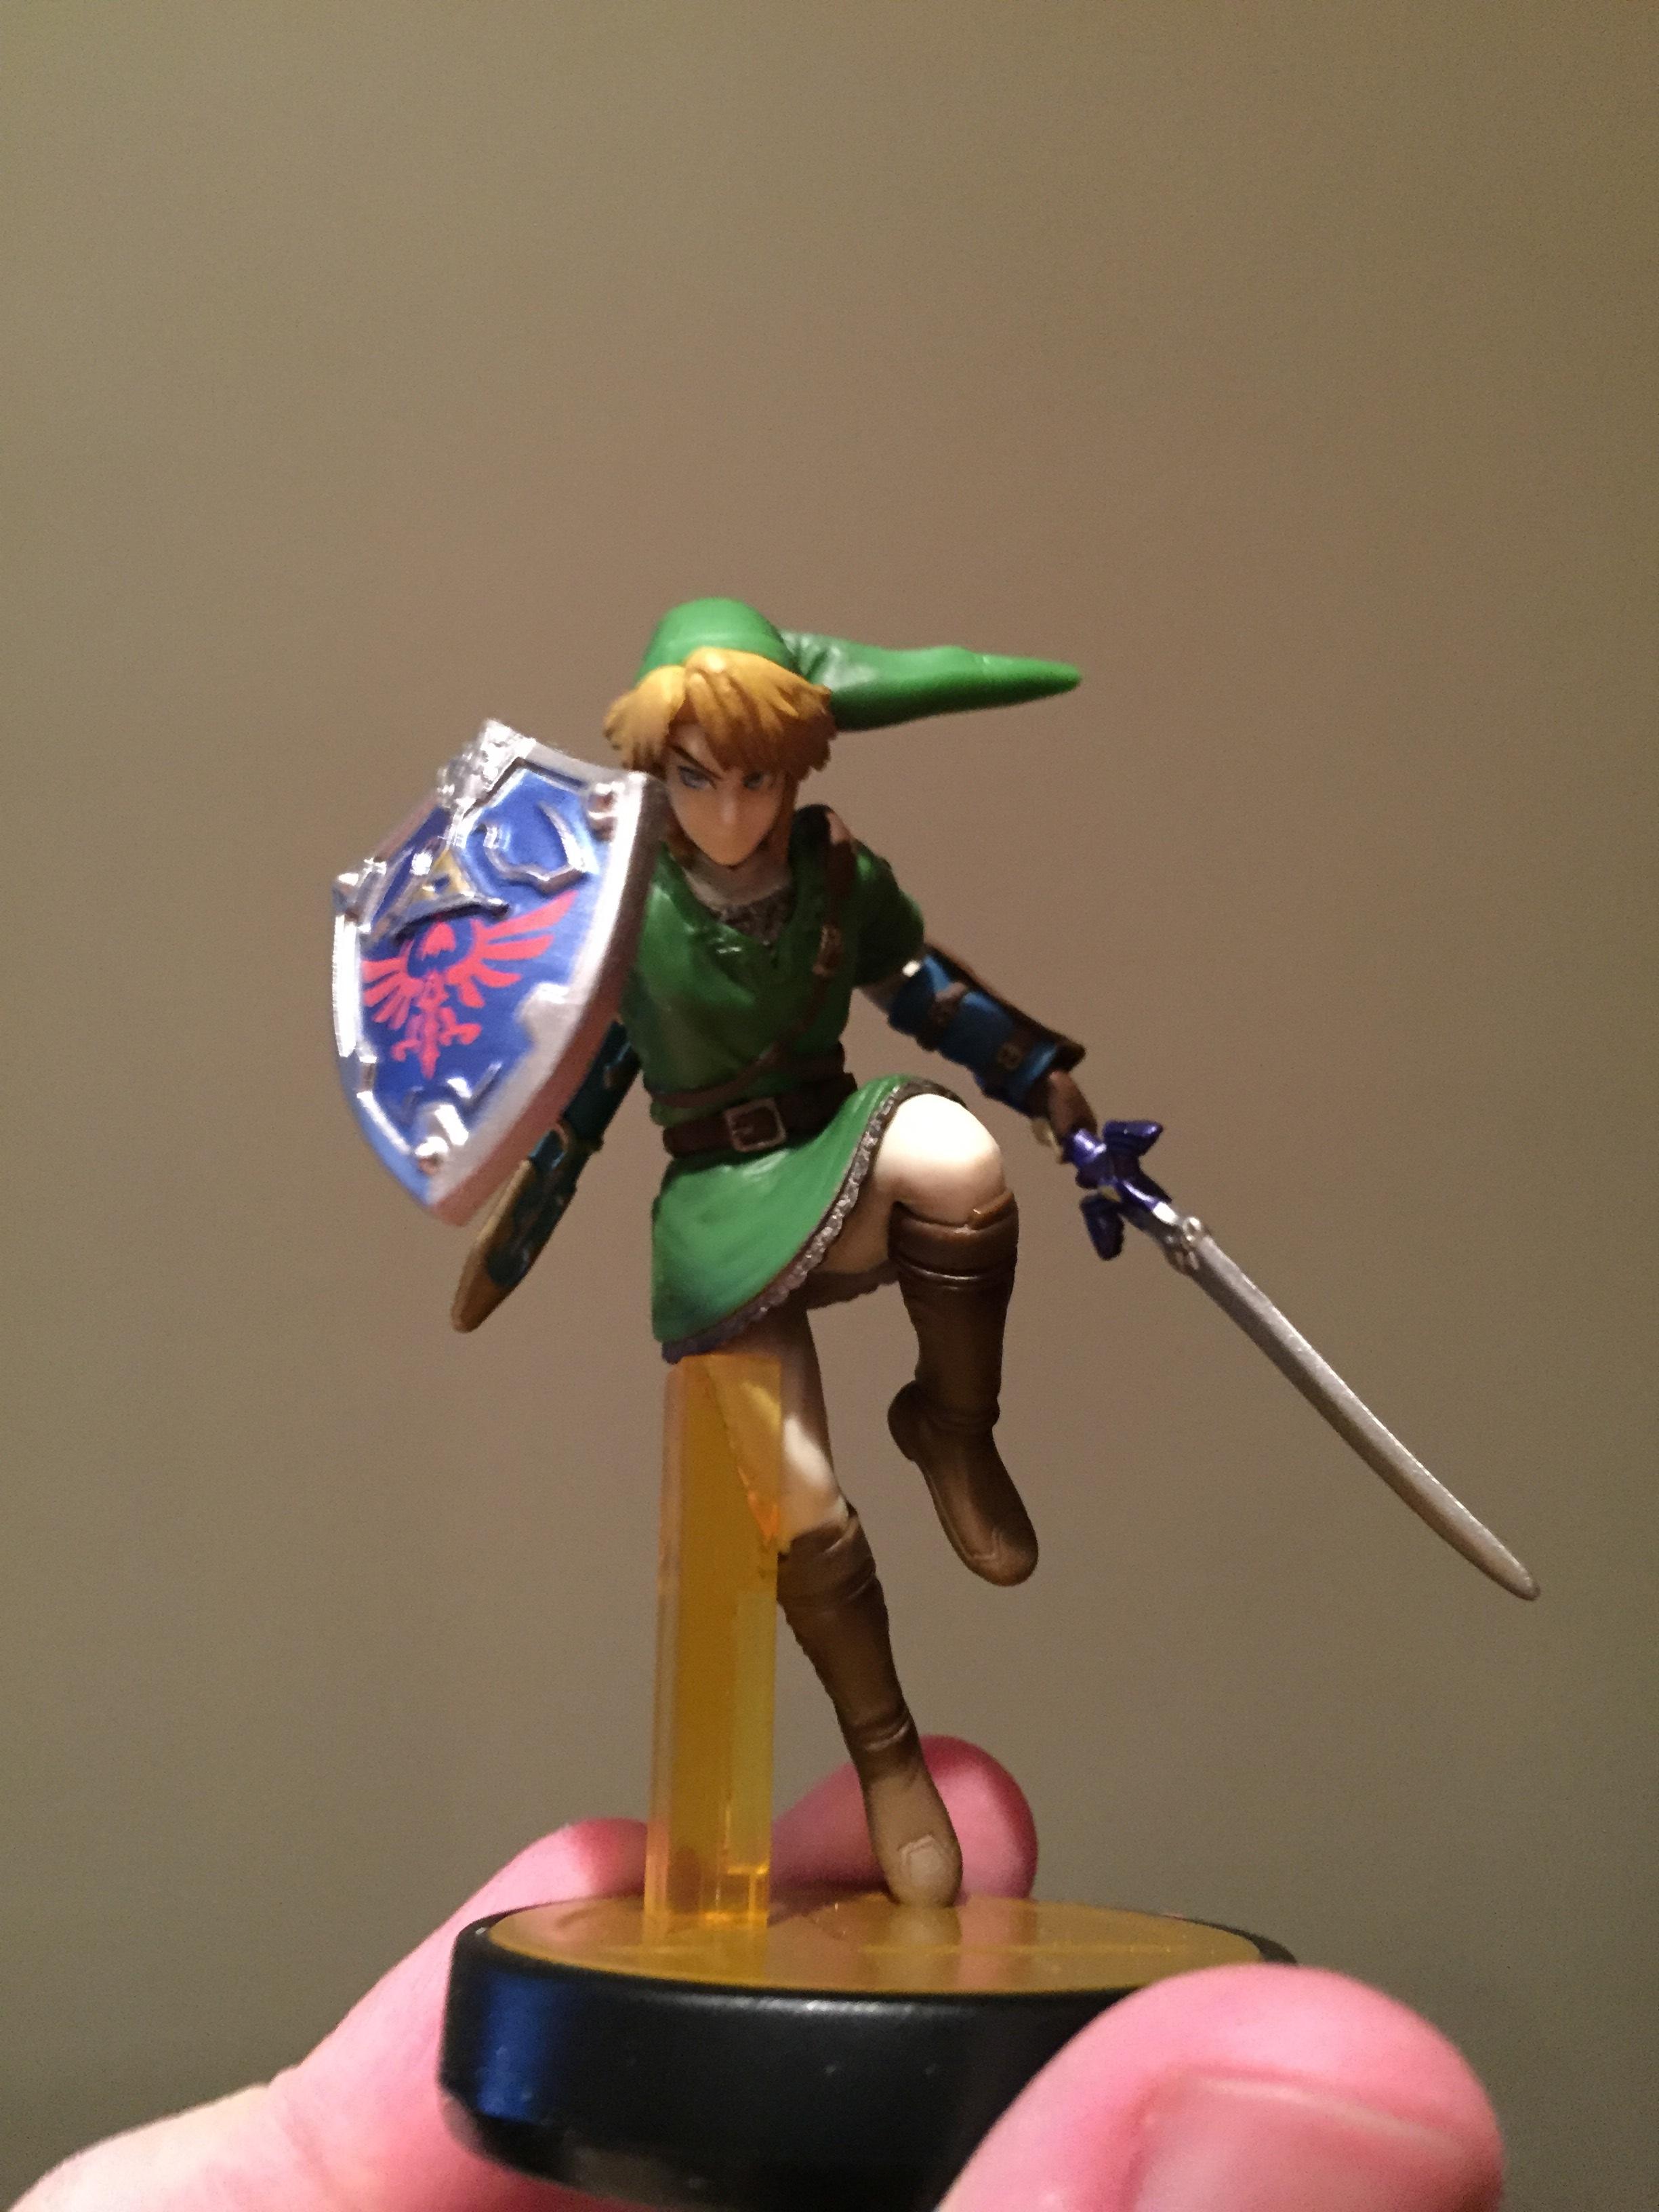 Impressions Nintendo Amiibo Figures Rightward Gamers